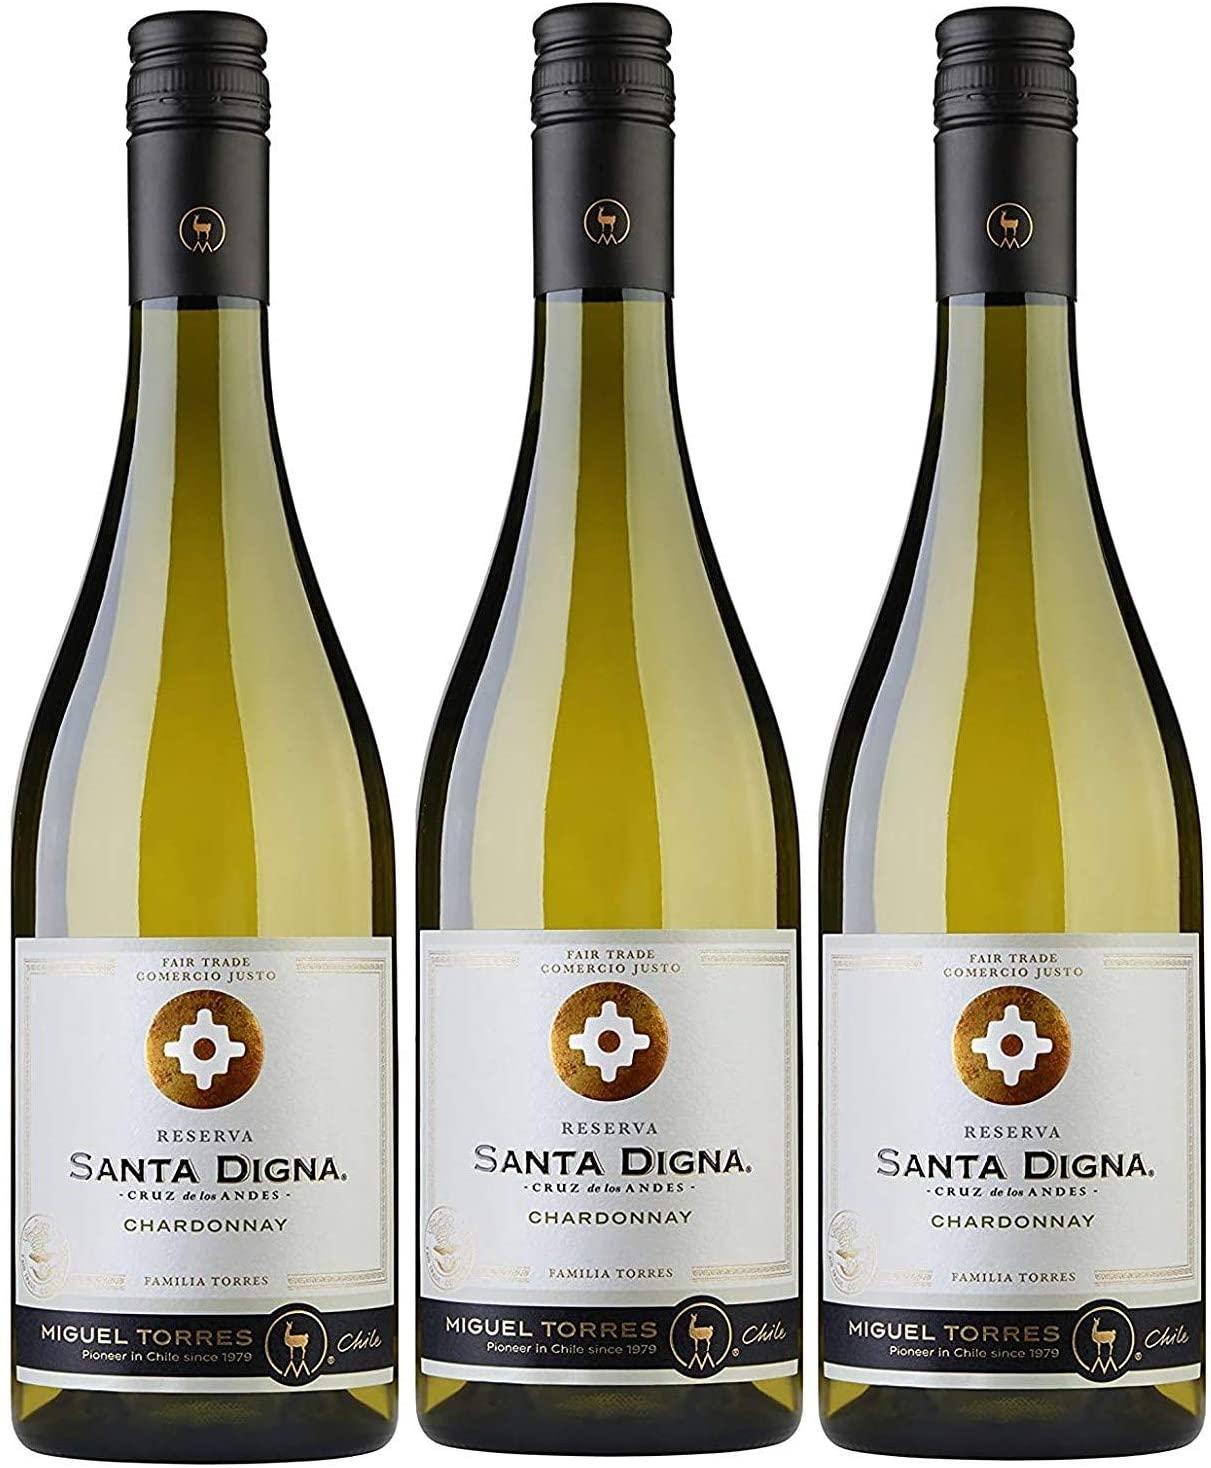 Santa Digna Chardonnay, Vino Blanco - 3 botellas de 75 cl, Total: 22500 ml